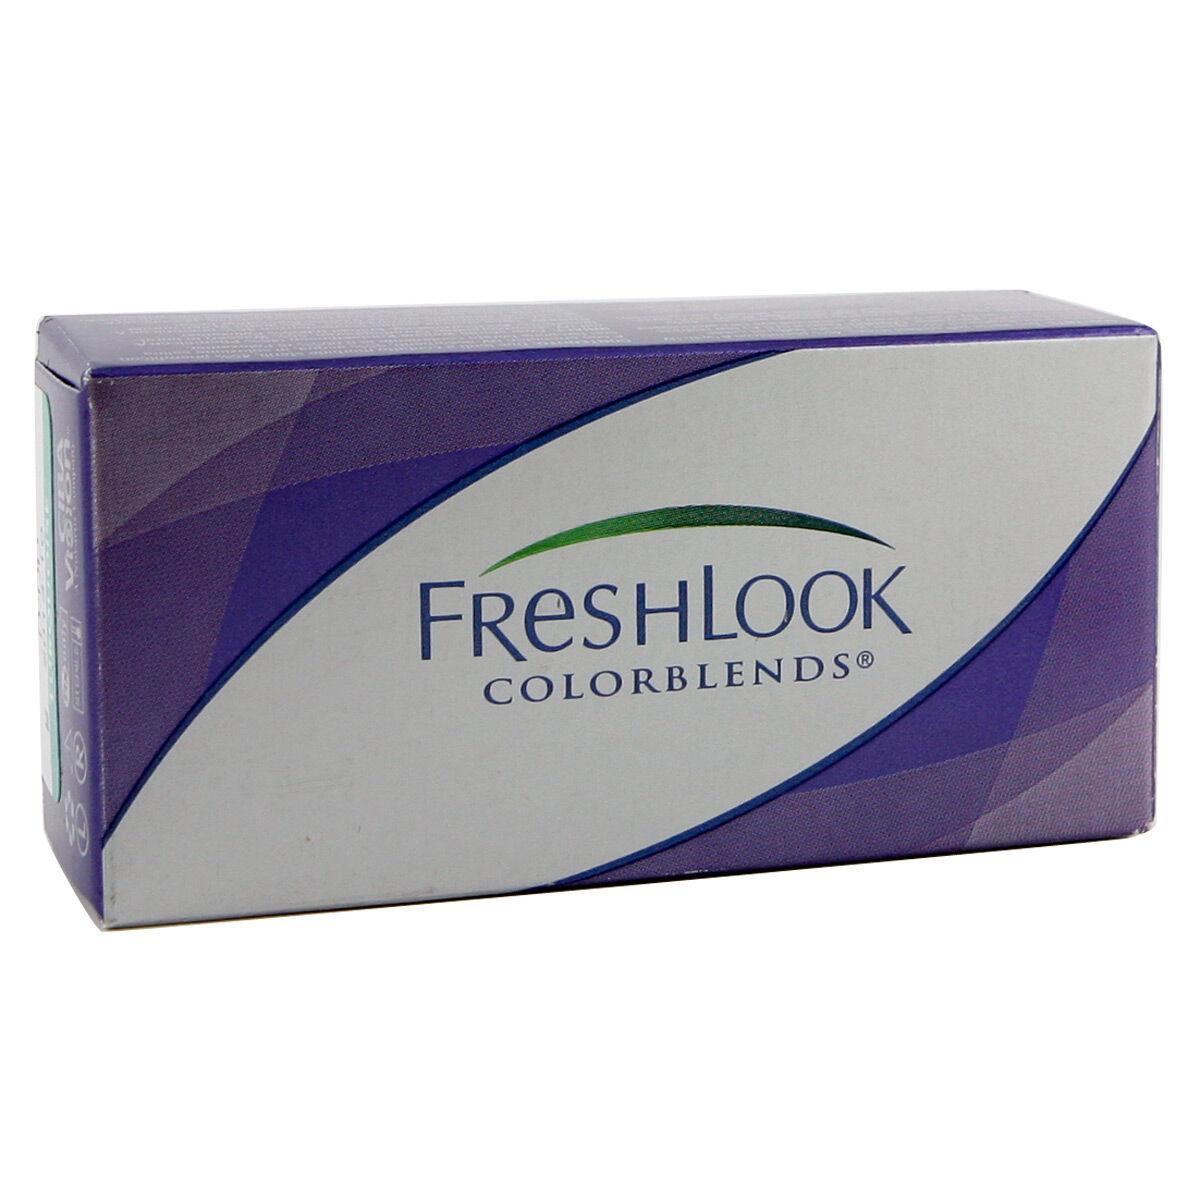 Alcon Freshlook Colorblends (2 Contact Lenses), Amethyst, Ciba Vision/Alcon, Monthly Coloured Lenses, Phemfilcon A